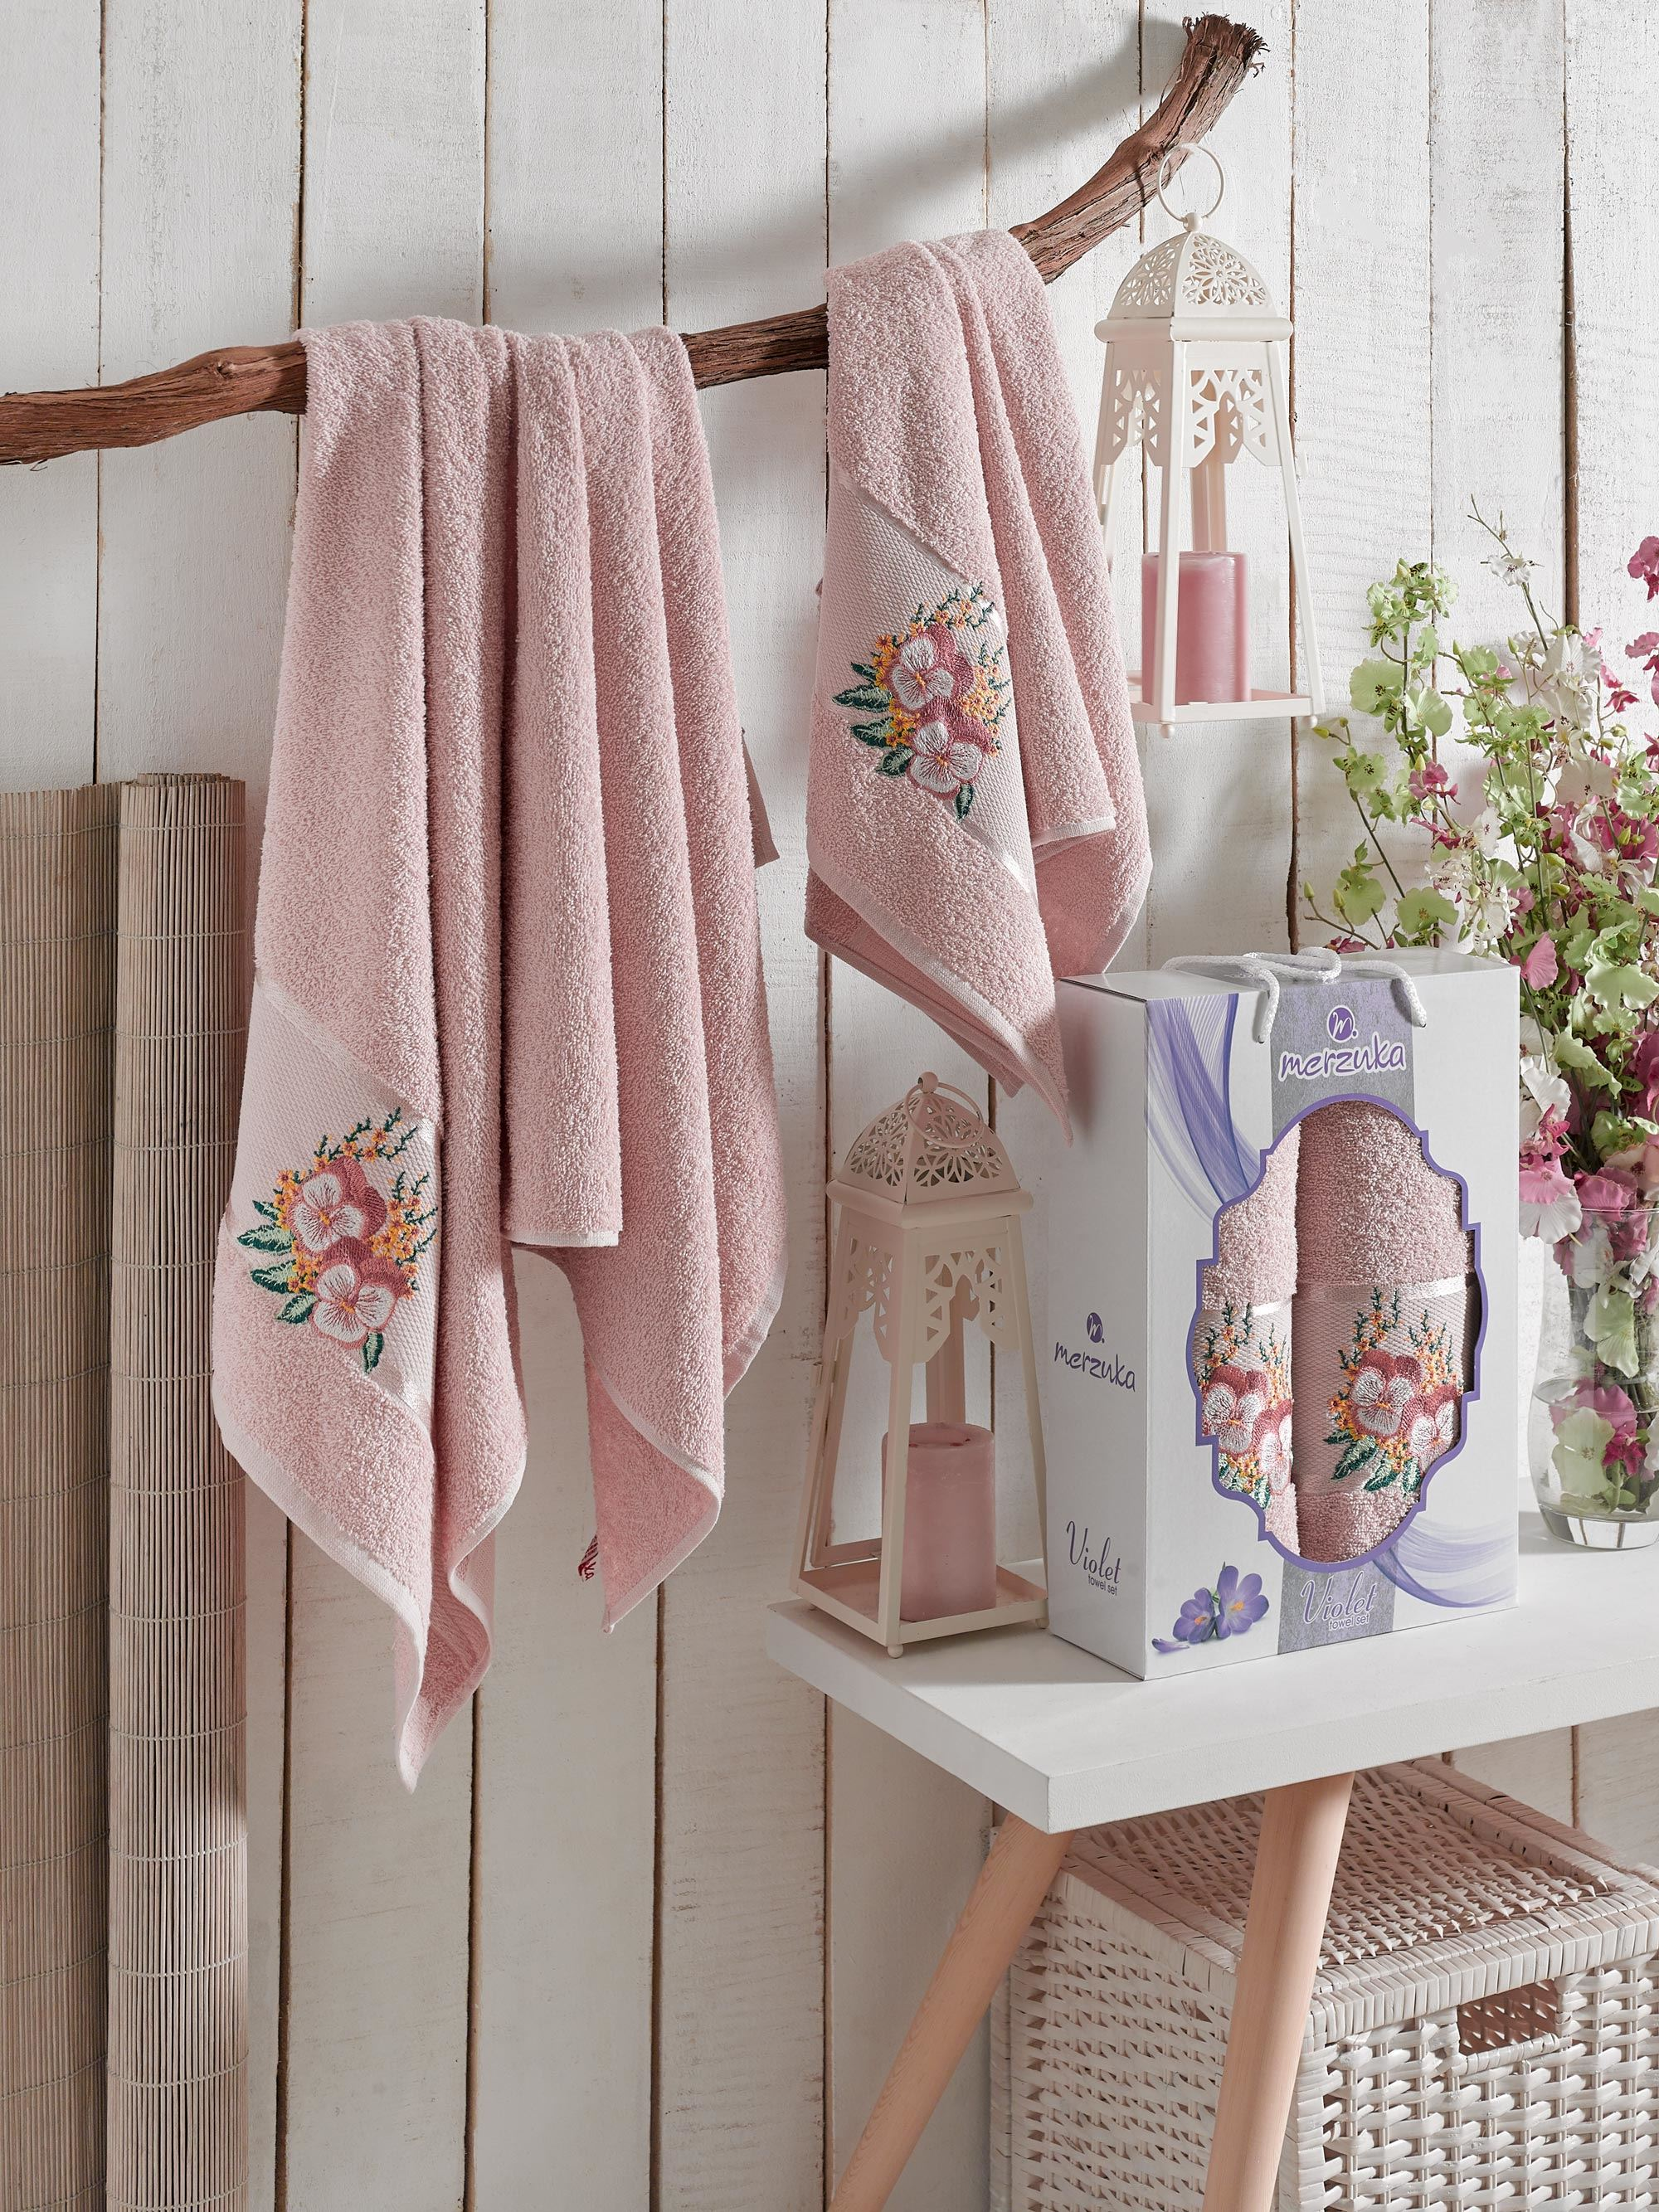 Полотенца Oran Merzuka Полотенце Violet Цвет: Розовый (50х80 см,70х130 см) полотенца oran merzuka полотенце daisy цвет сиреневый 50х80 см 2 шт 70х130 см